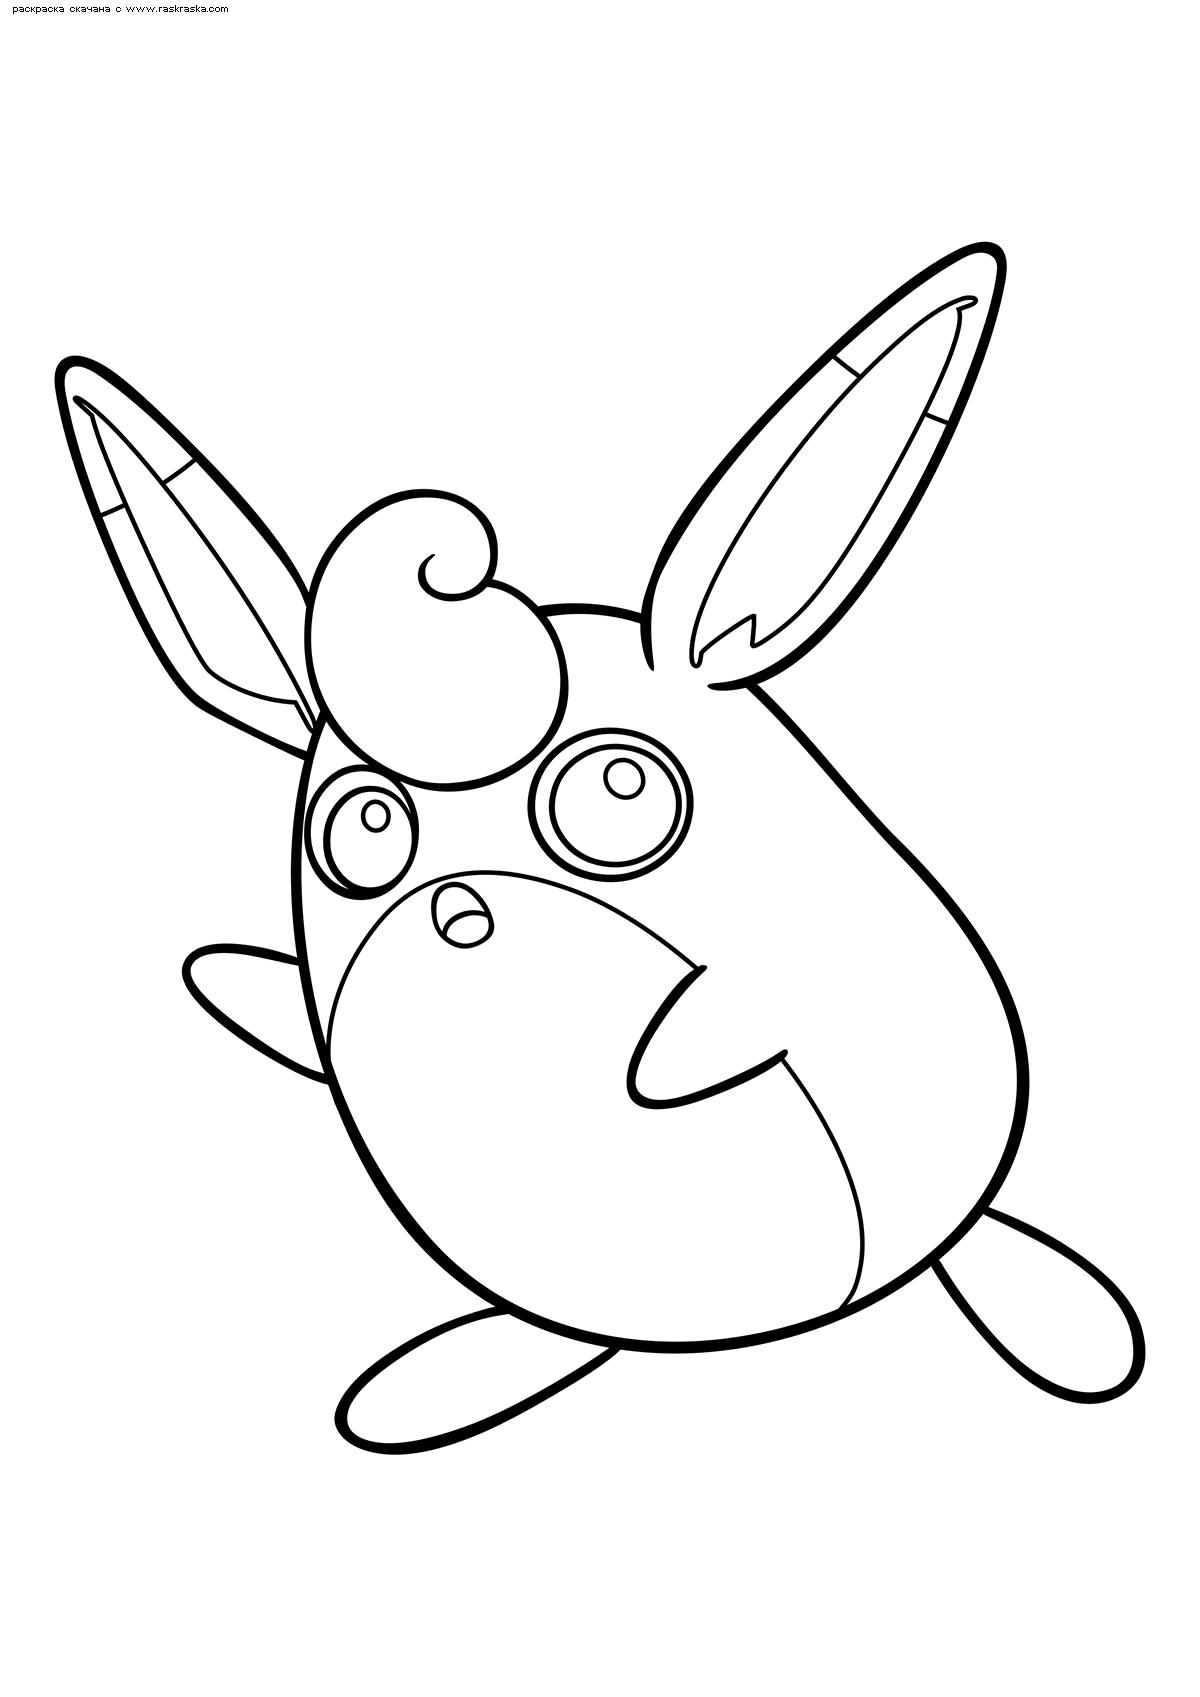 Раскраска Покемон Вигглитафф (Wigglytuff) | Раскраски ...